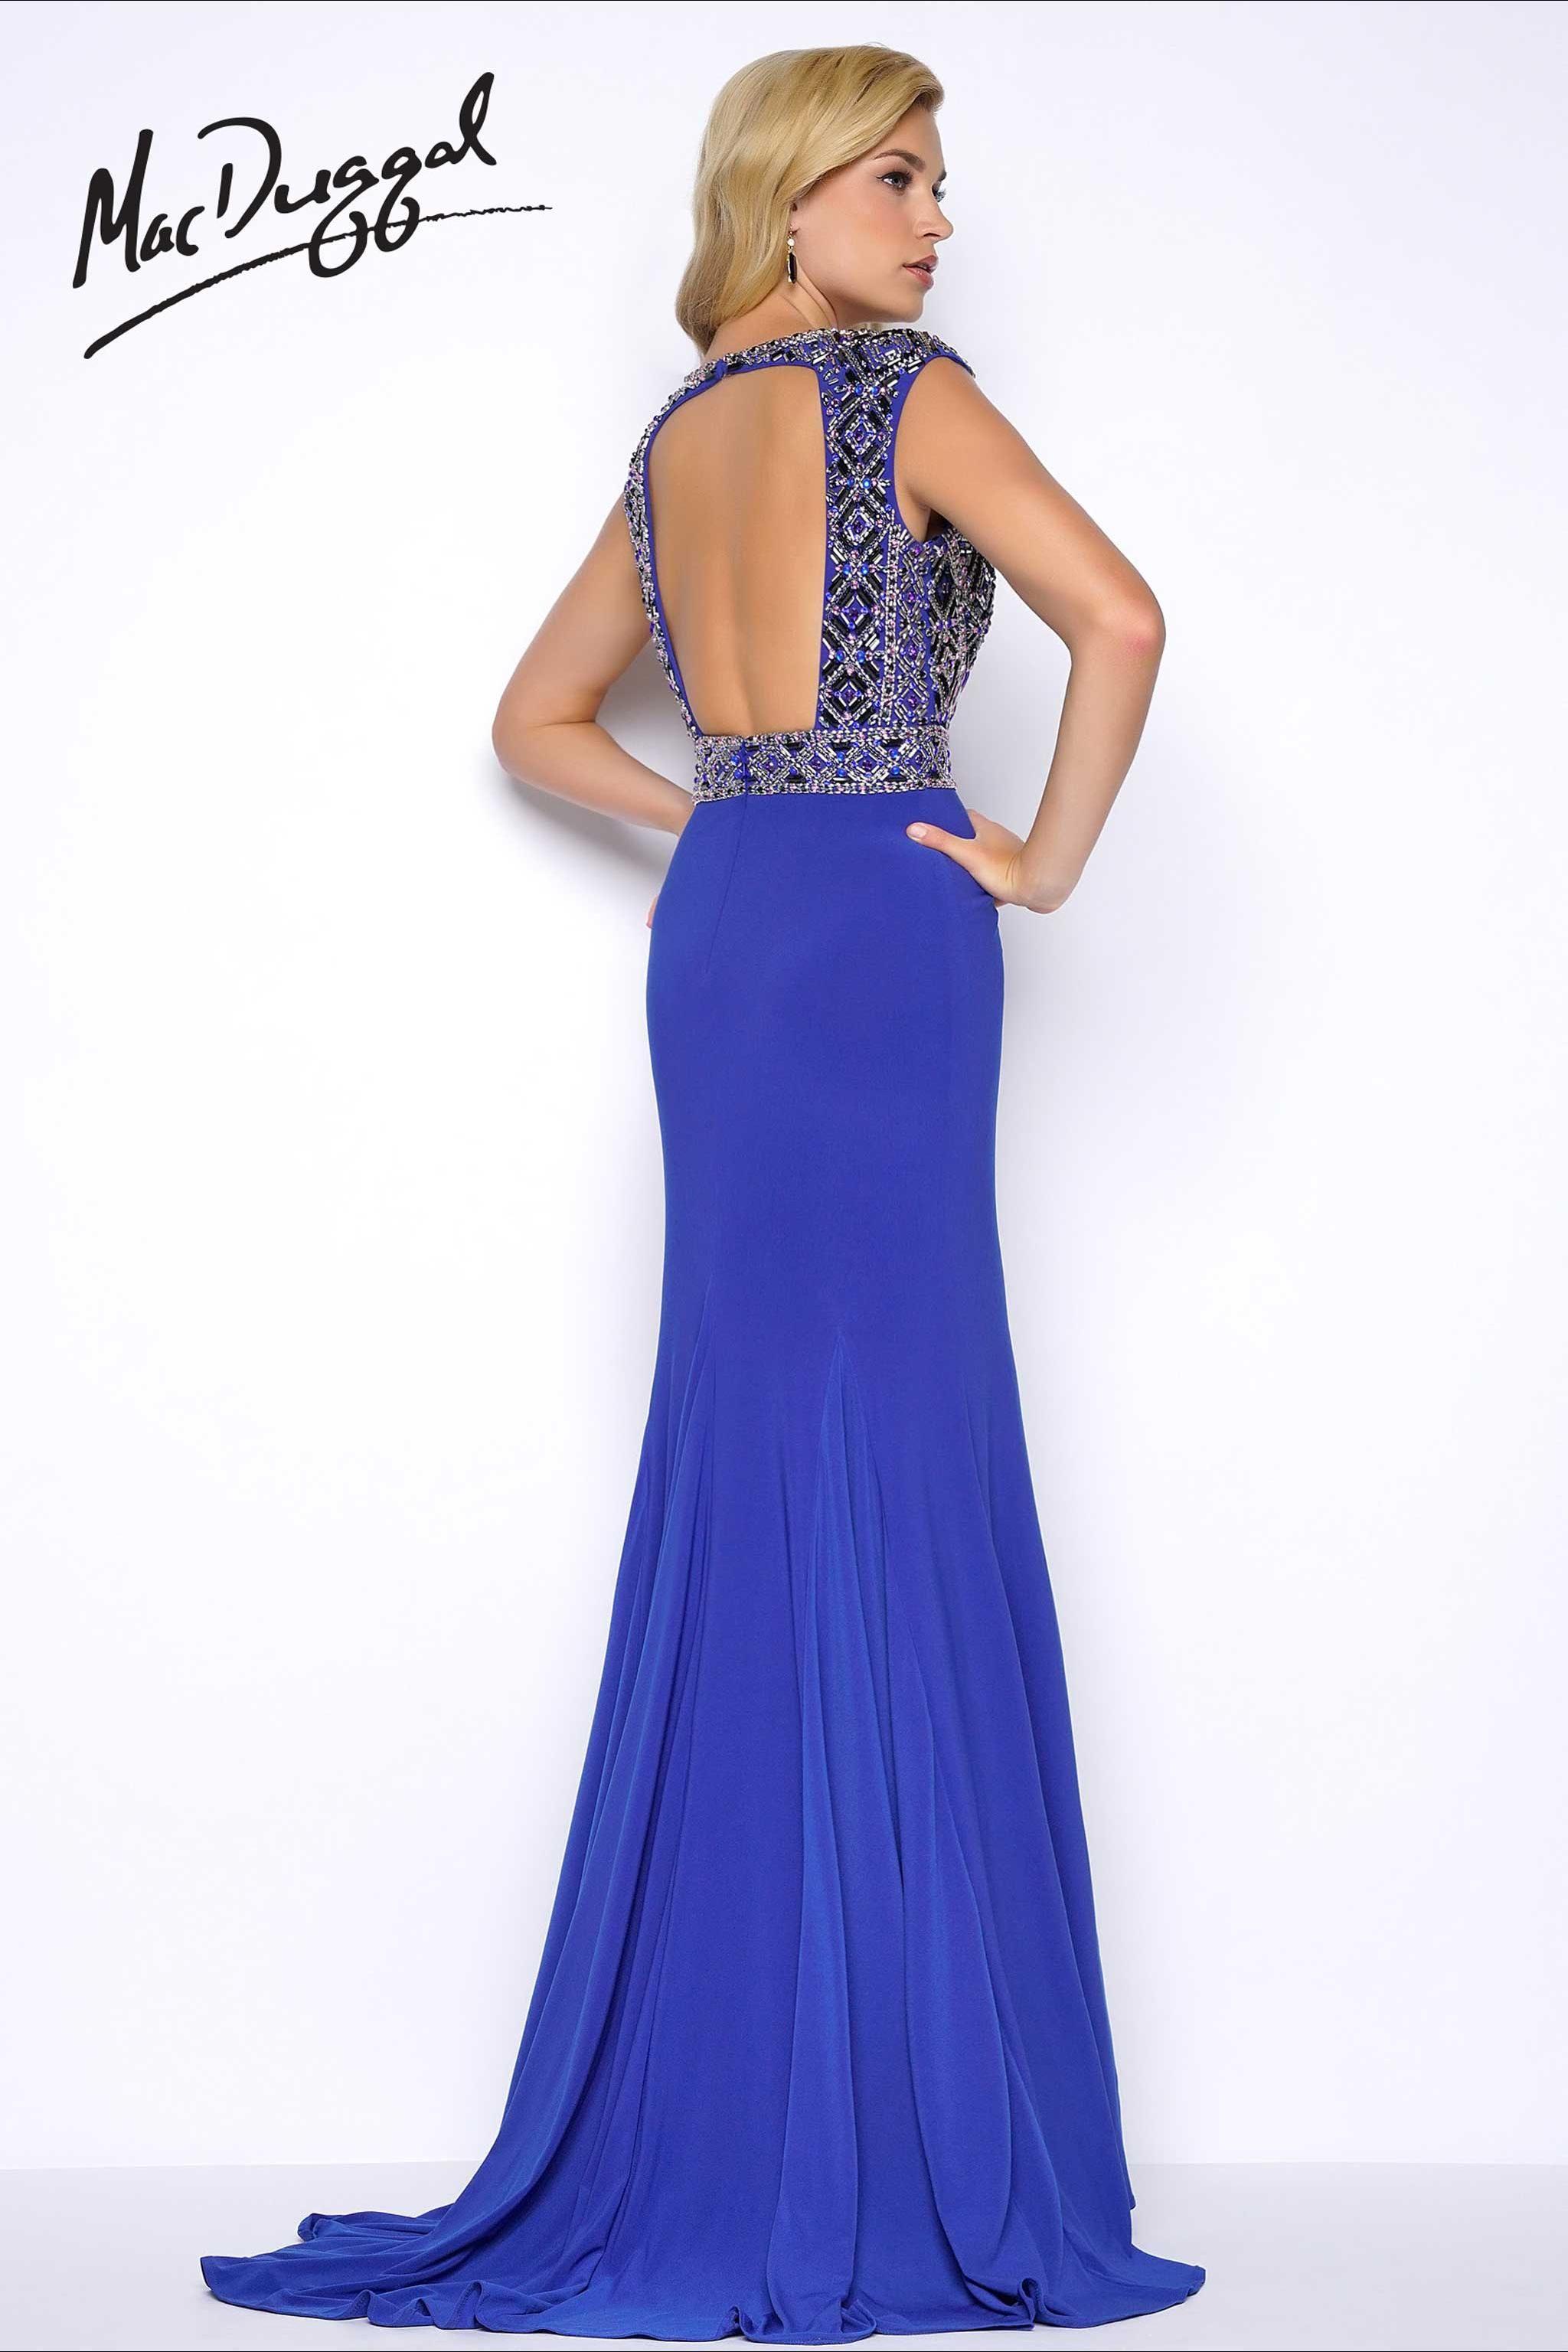 ef88118bfb0 Sapphire High Slit Prom Dress - back